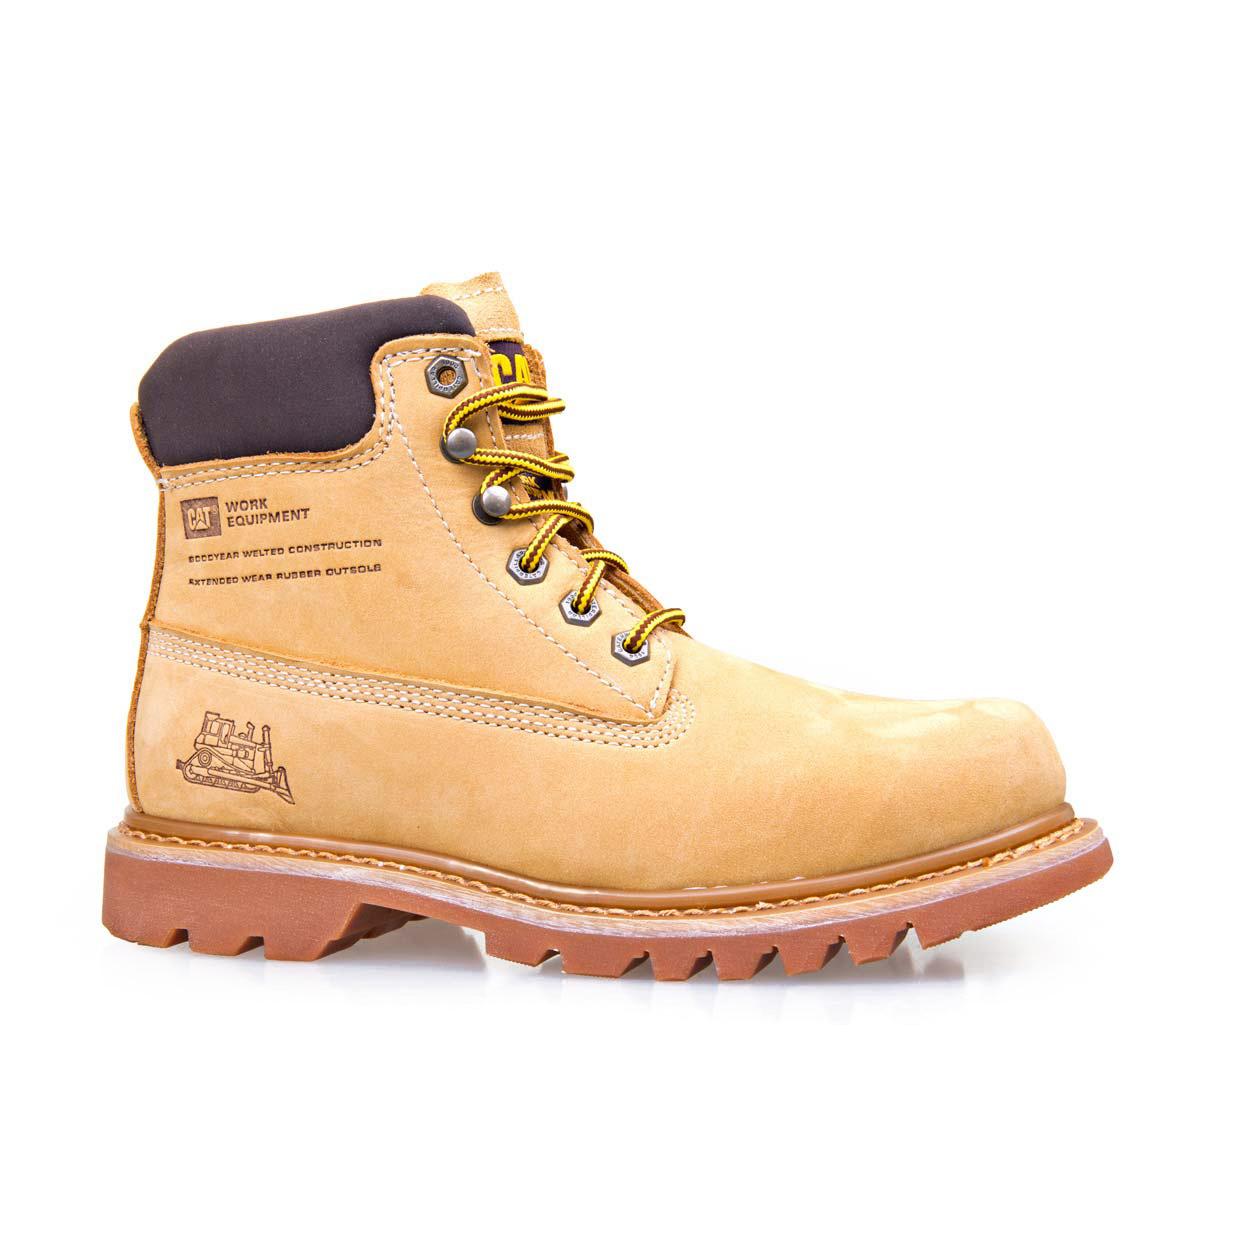 dbe50872 Bruiser - Honey nubuck - Mens - CAT Footwear